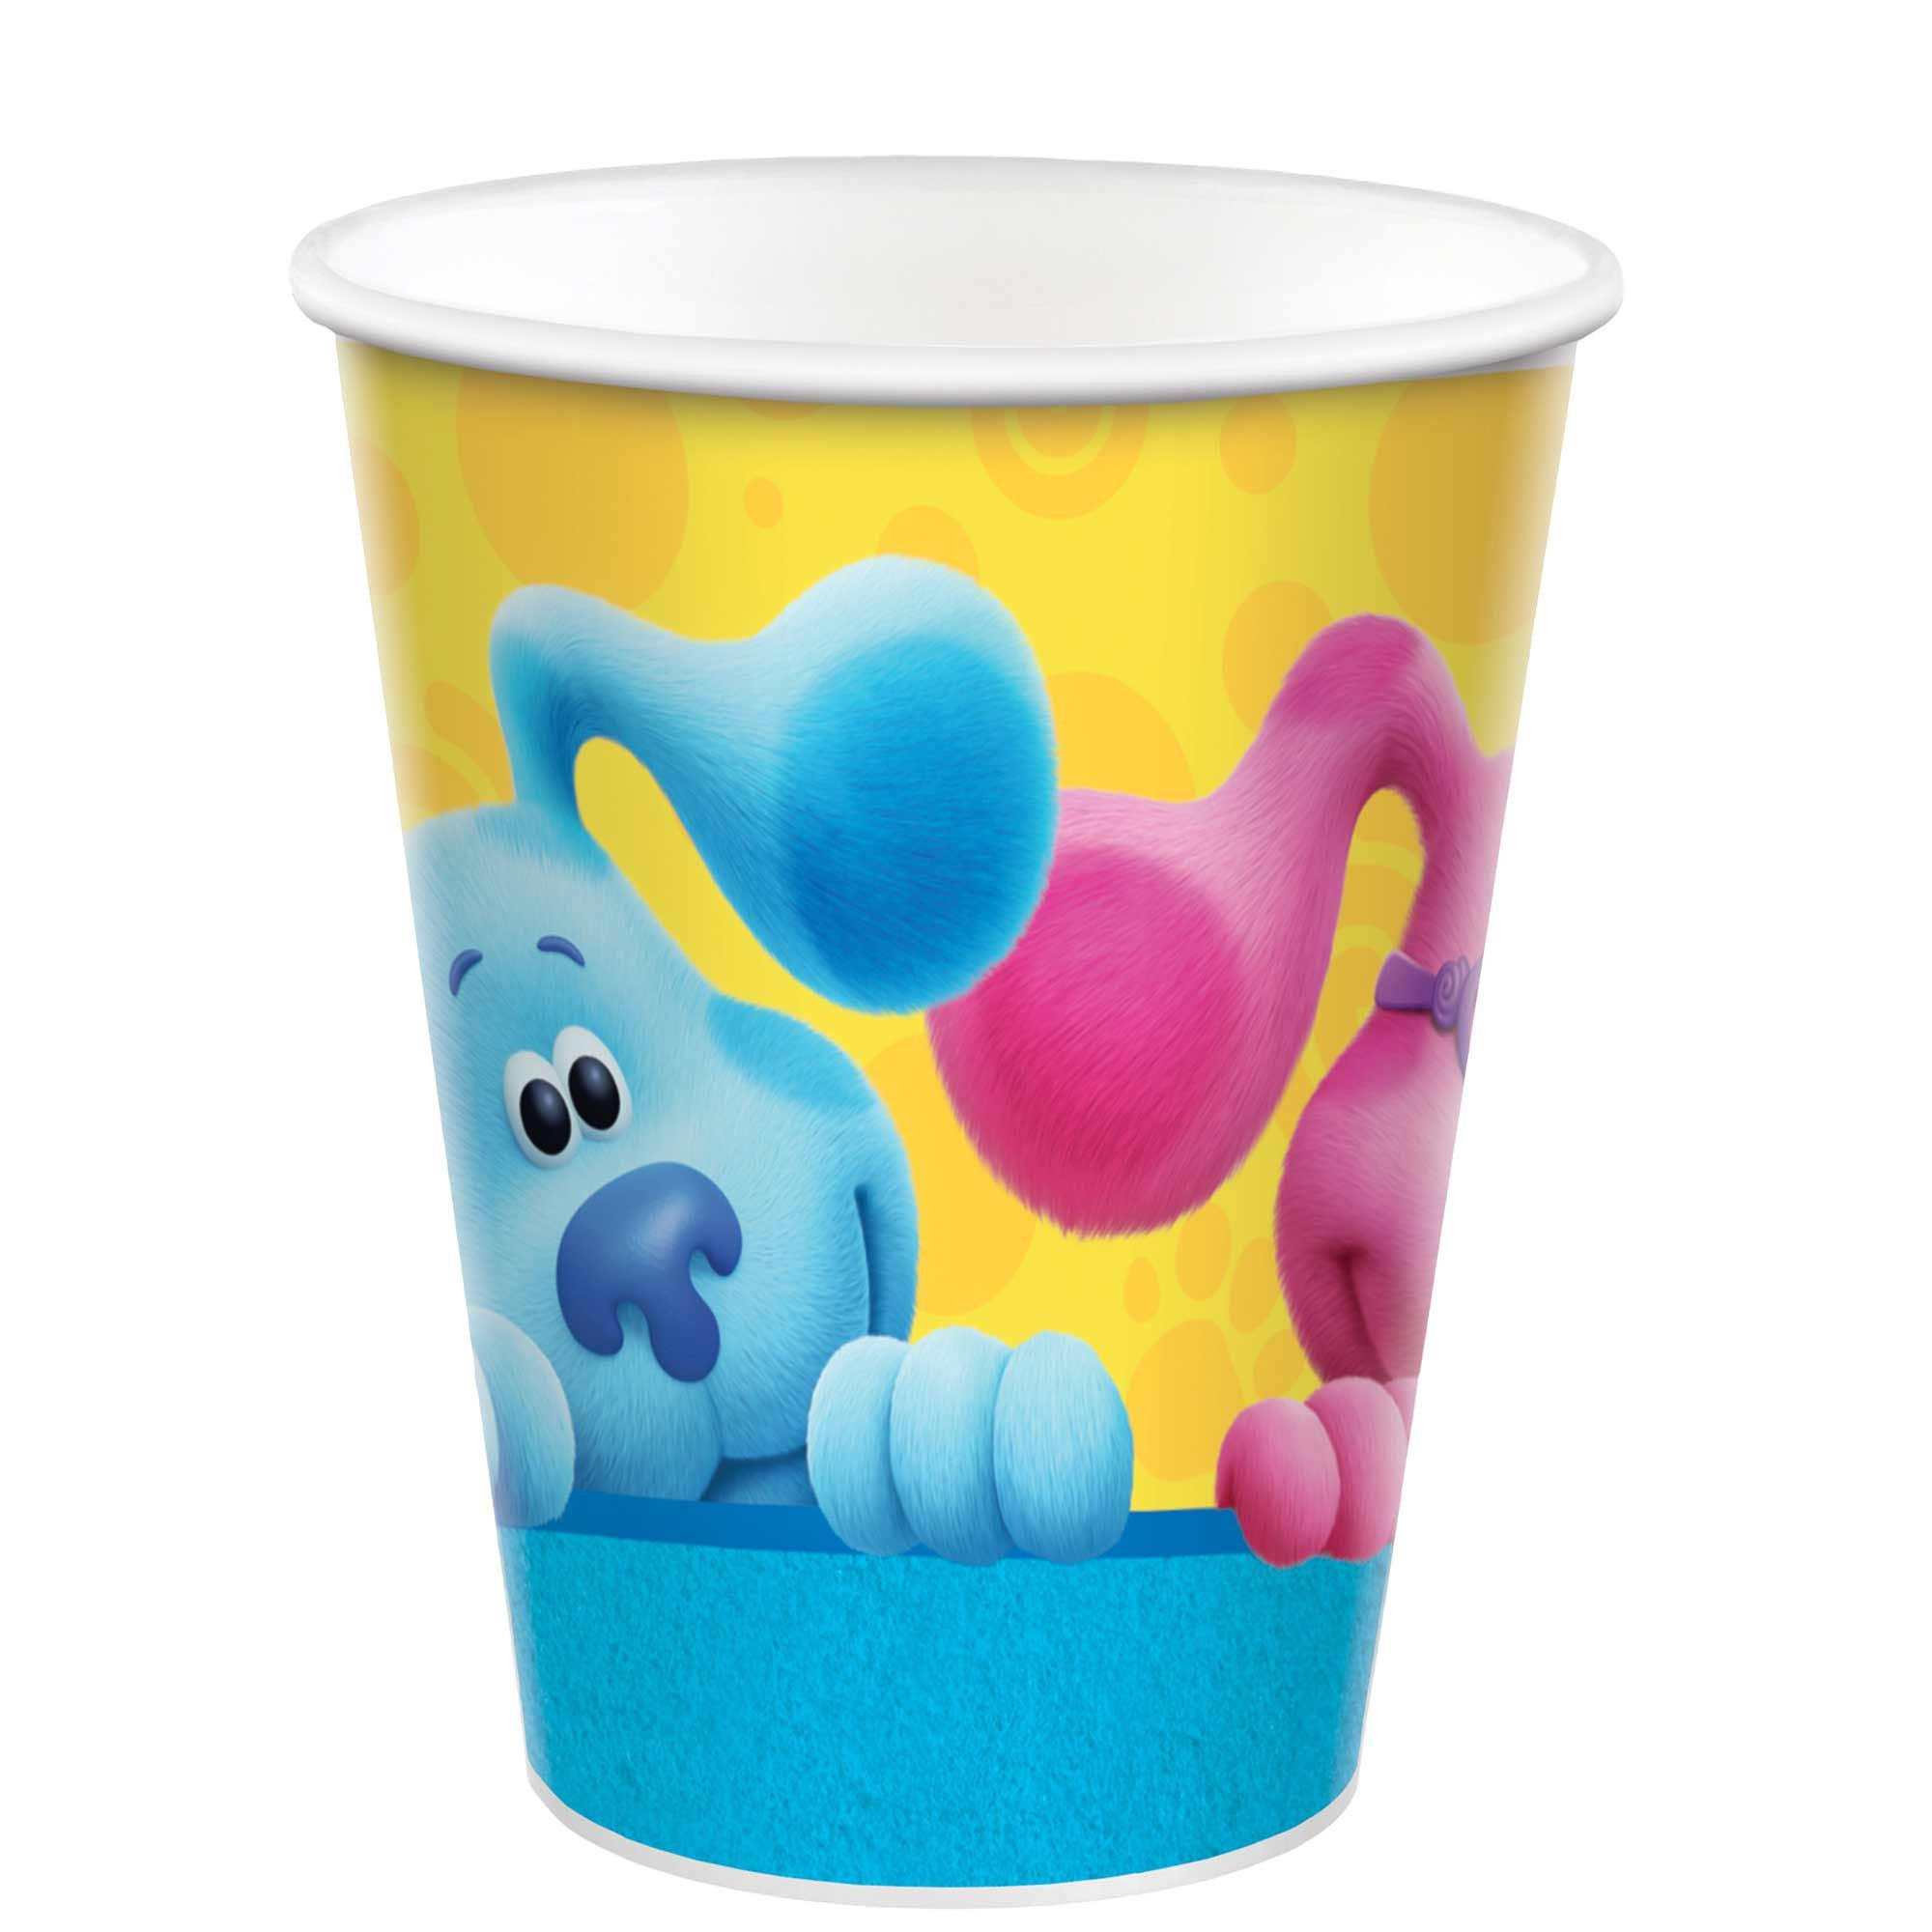 Blue's Clues 9oz / 266ml Paper Cups